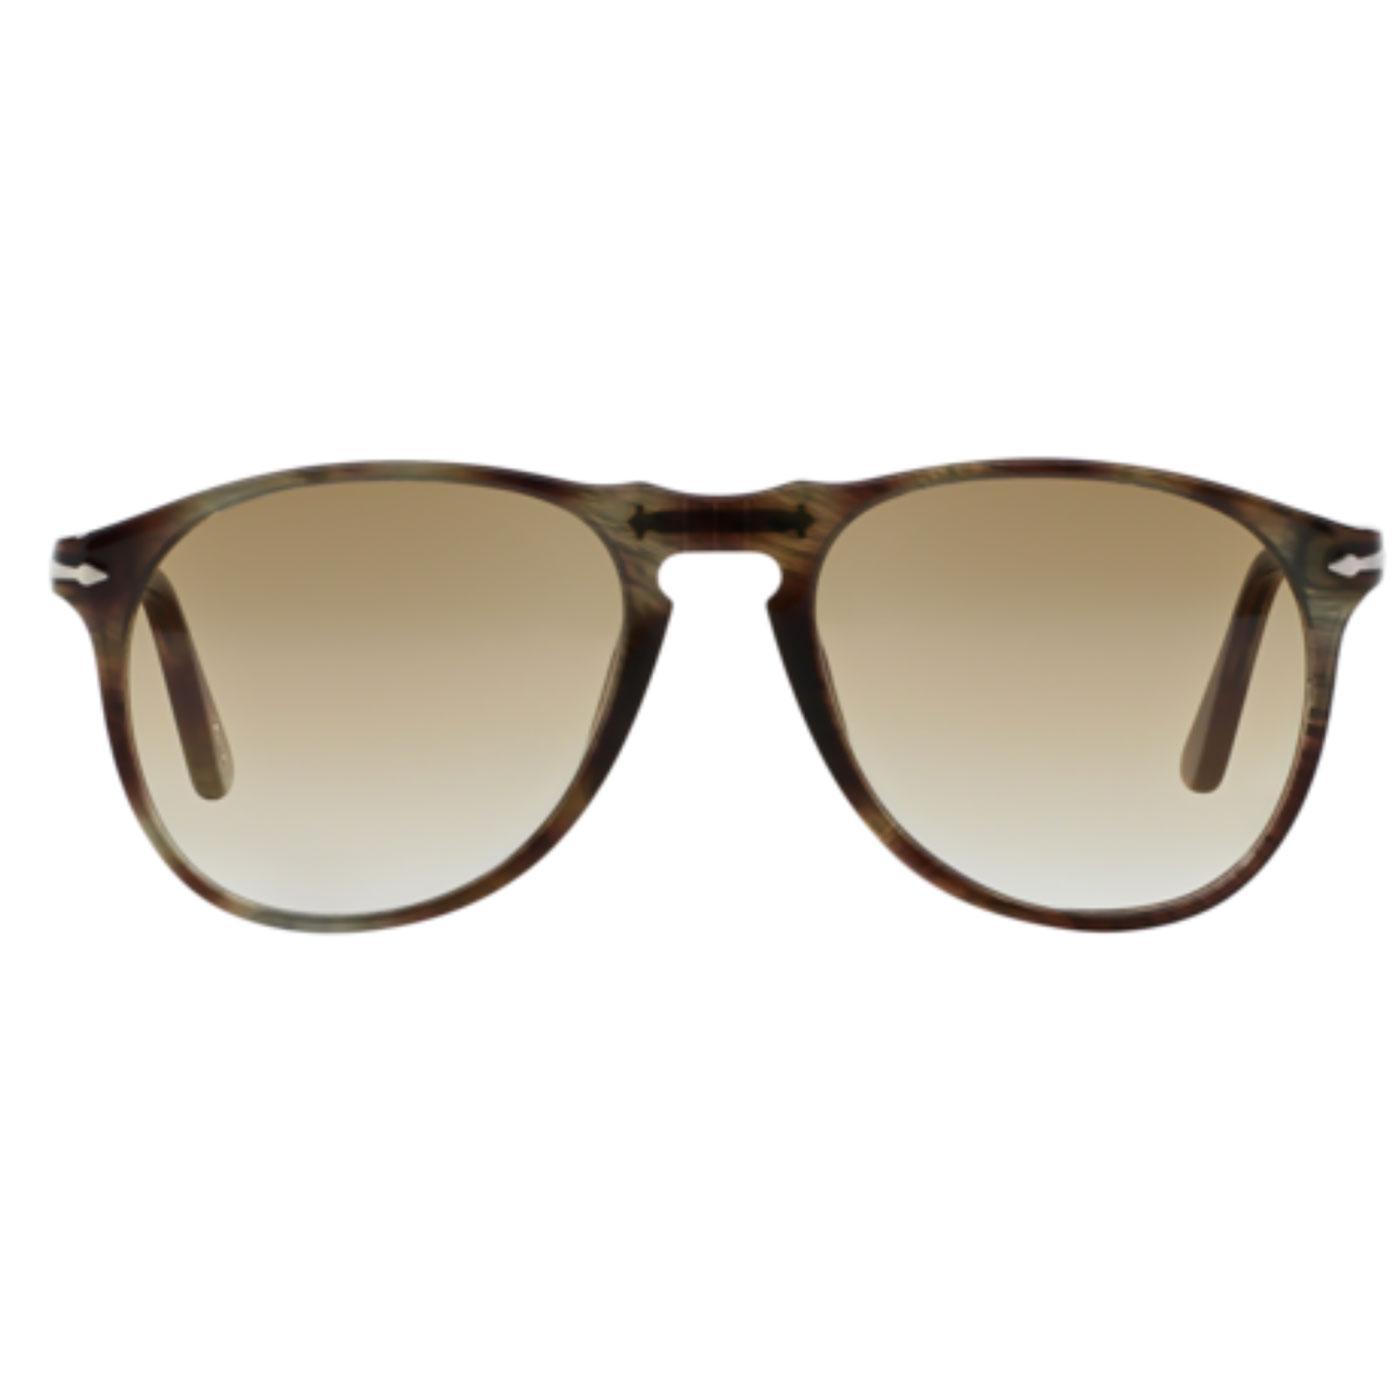 649 Series PERSOL Sunglasses (Havana Brown Smoke)